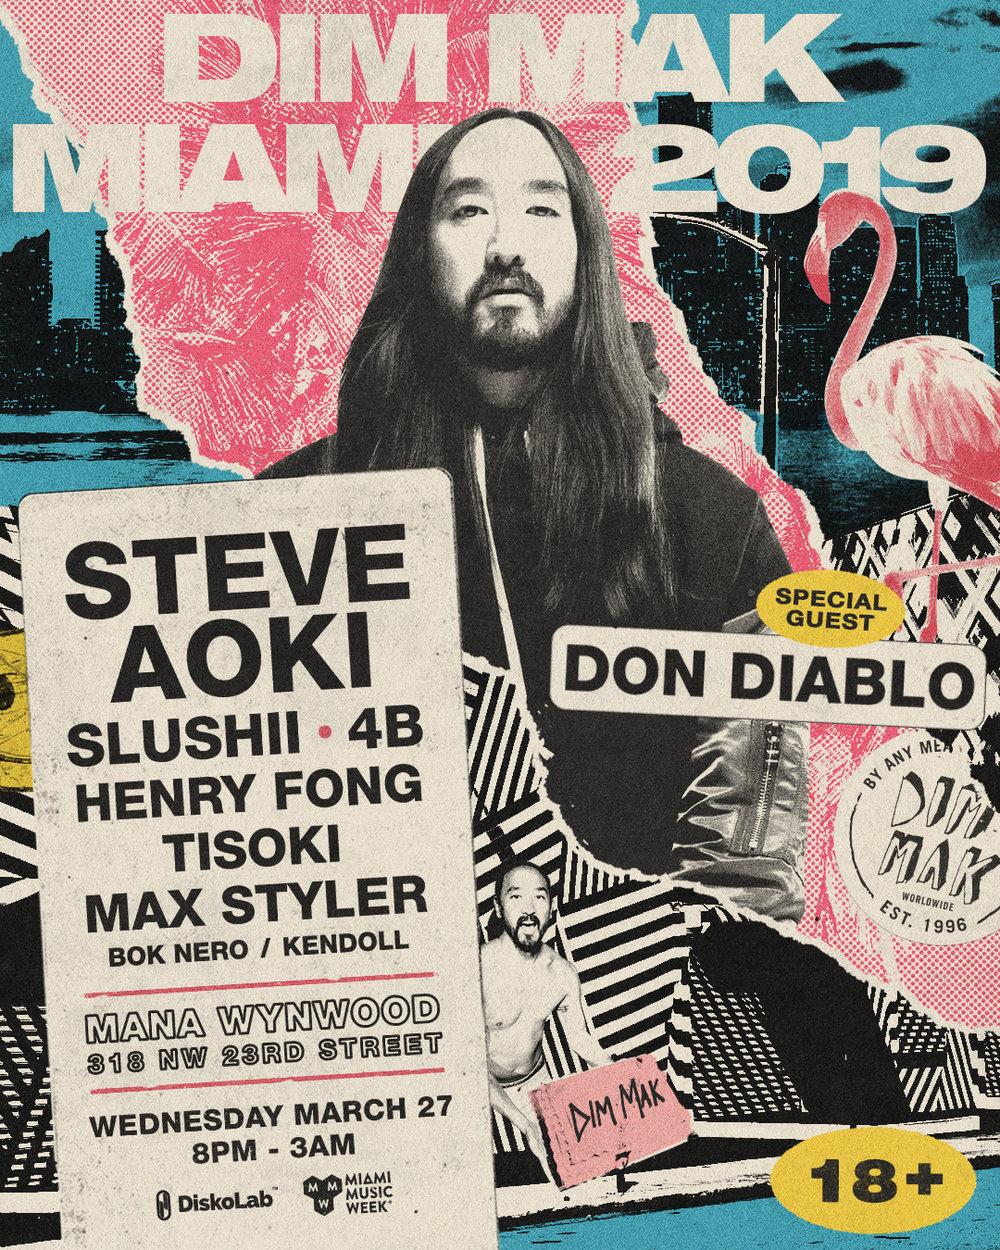 DimMak Miami 2019 steve aoki